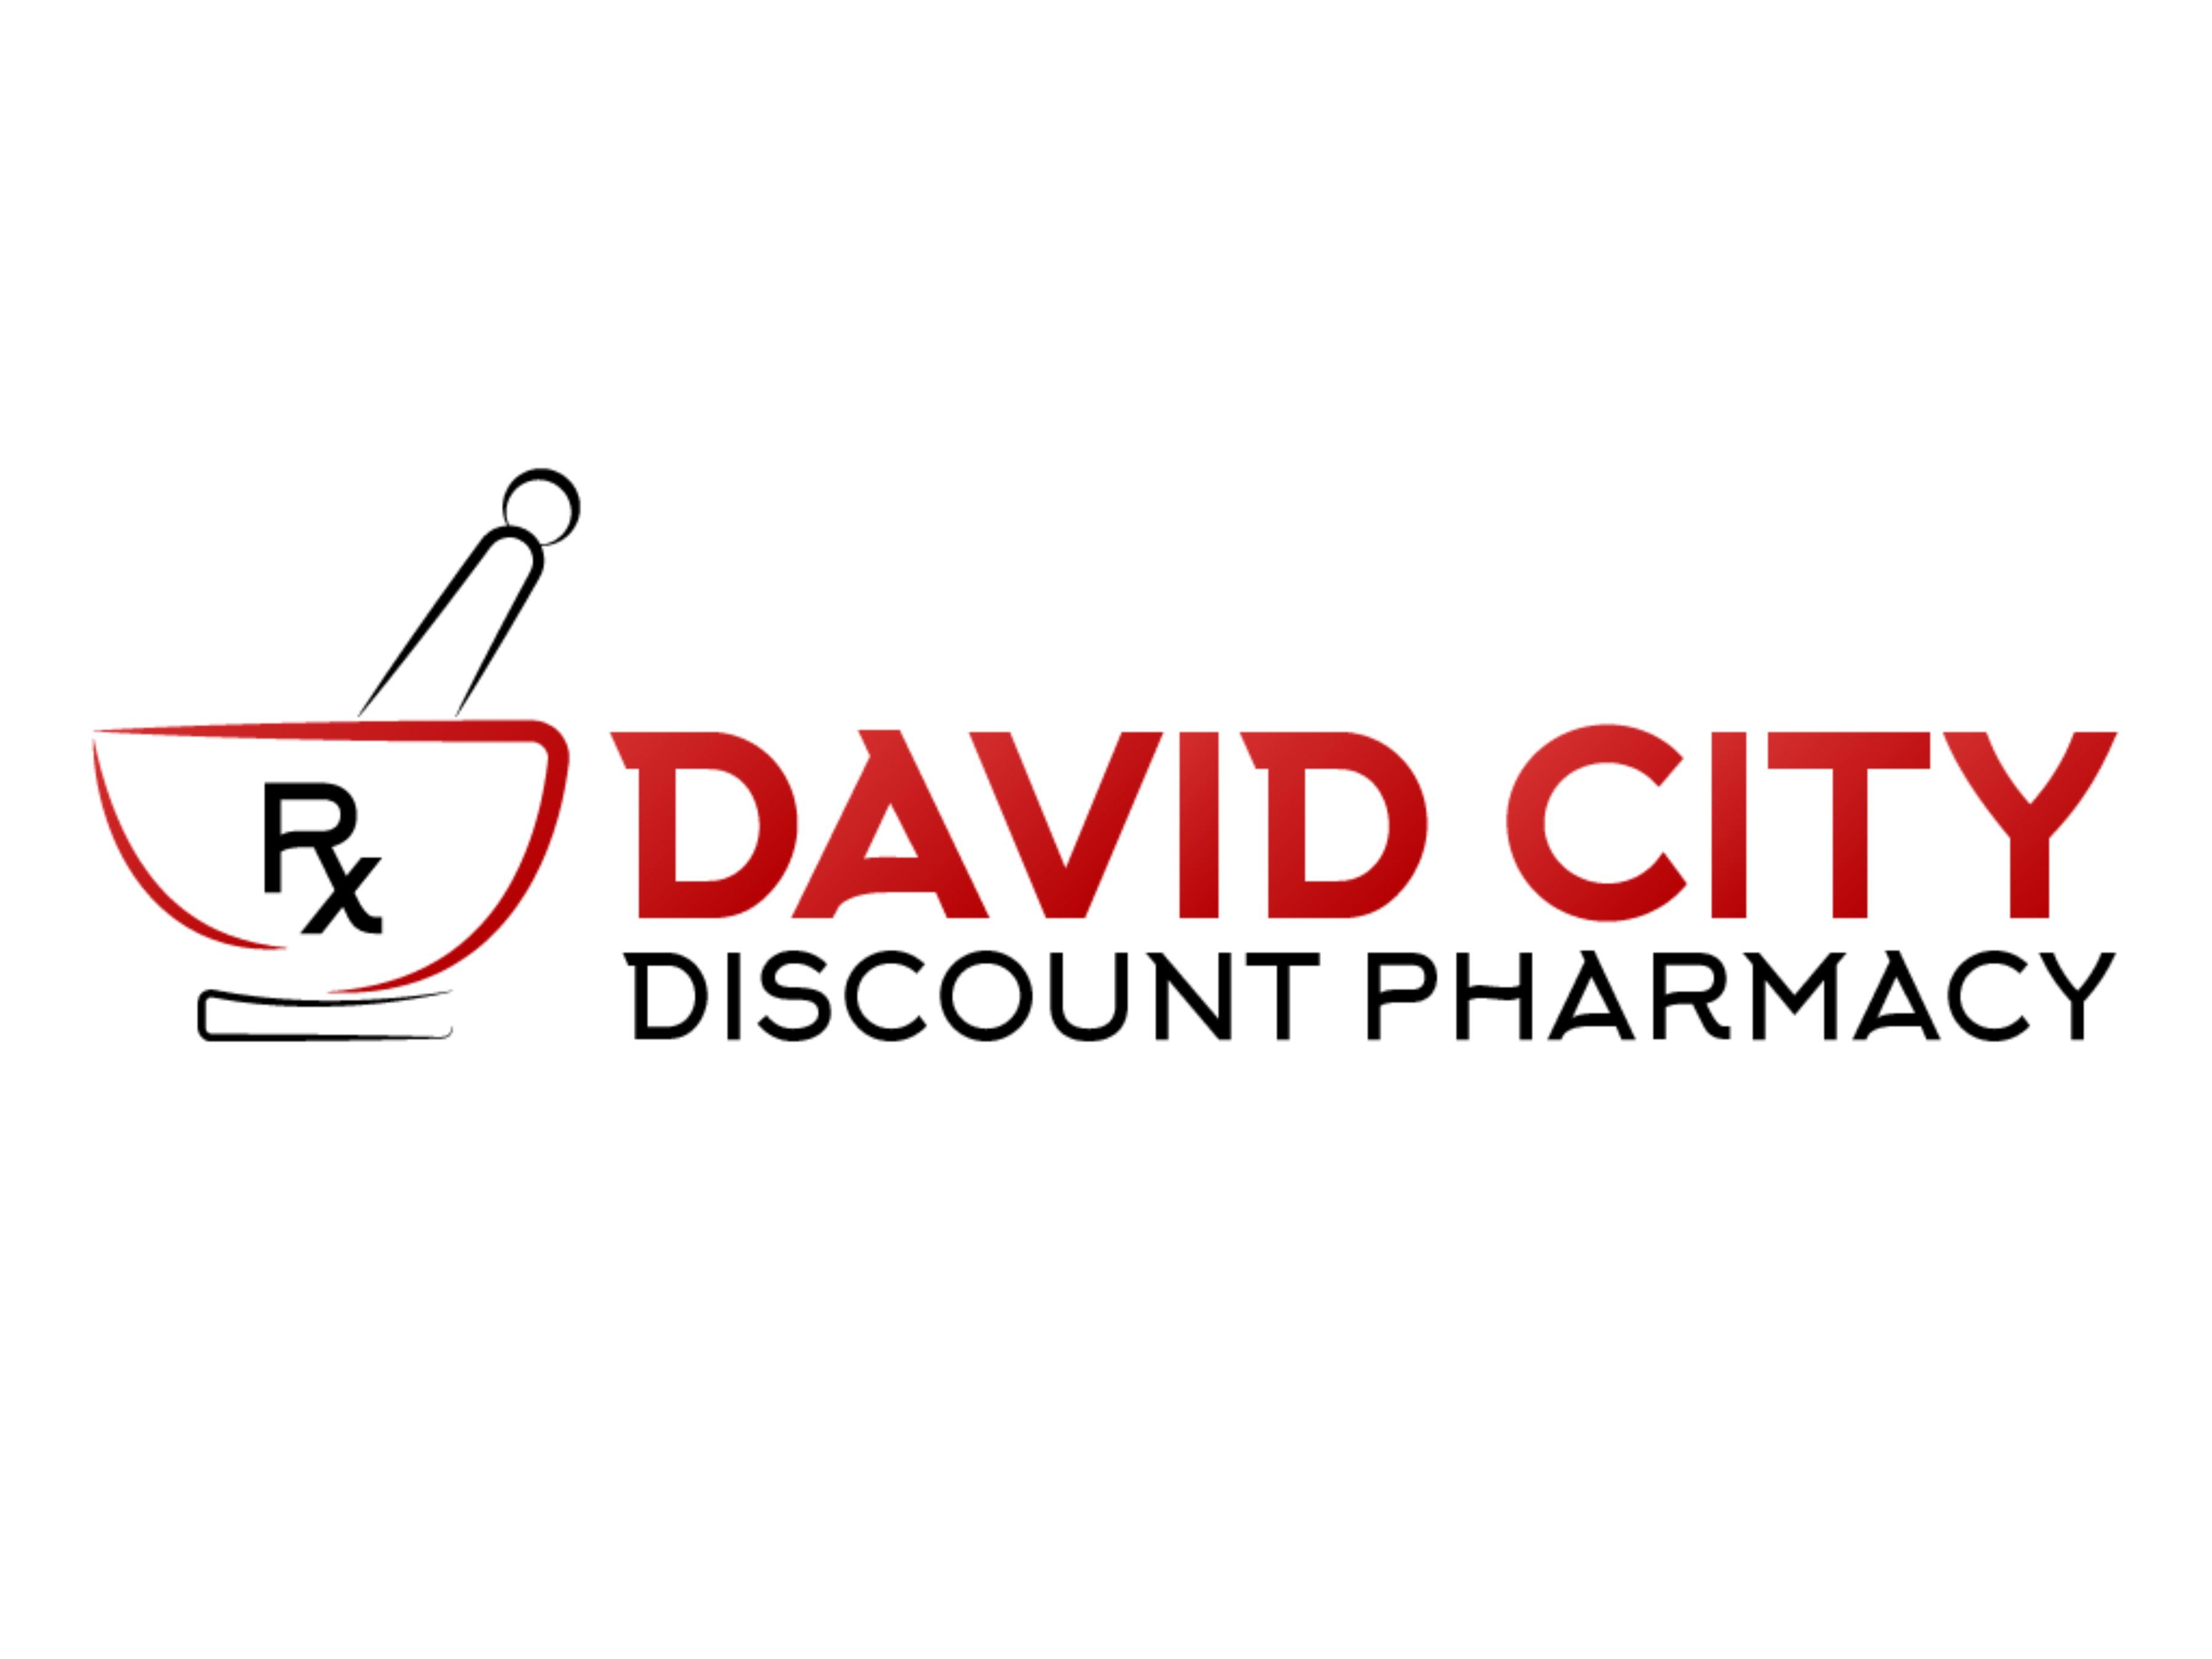 David City Discount Pharmacy